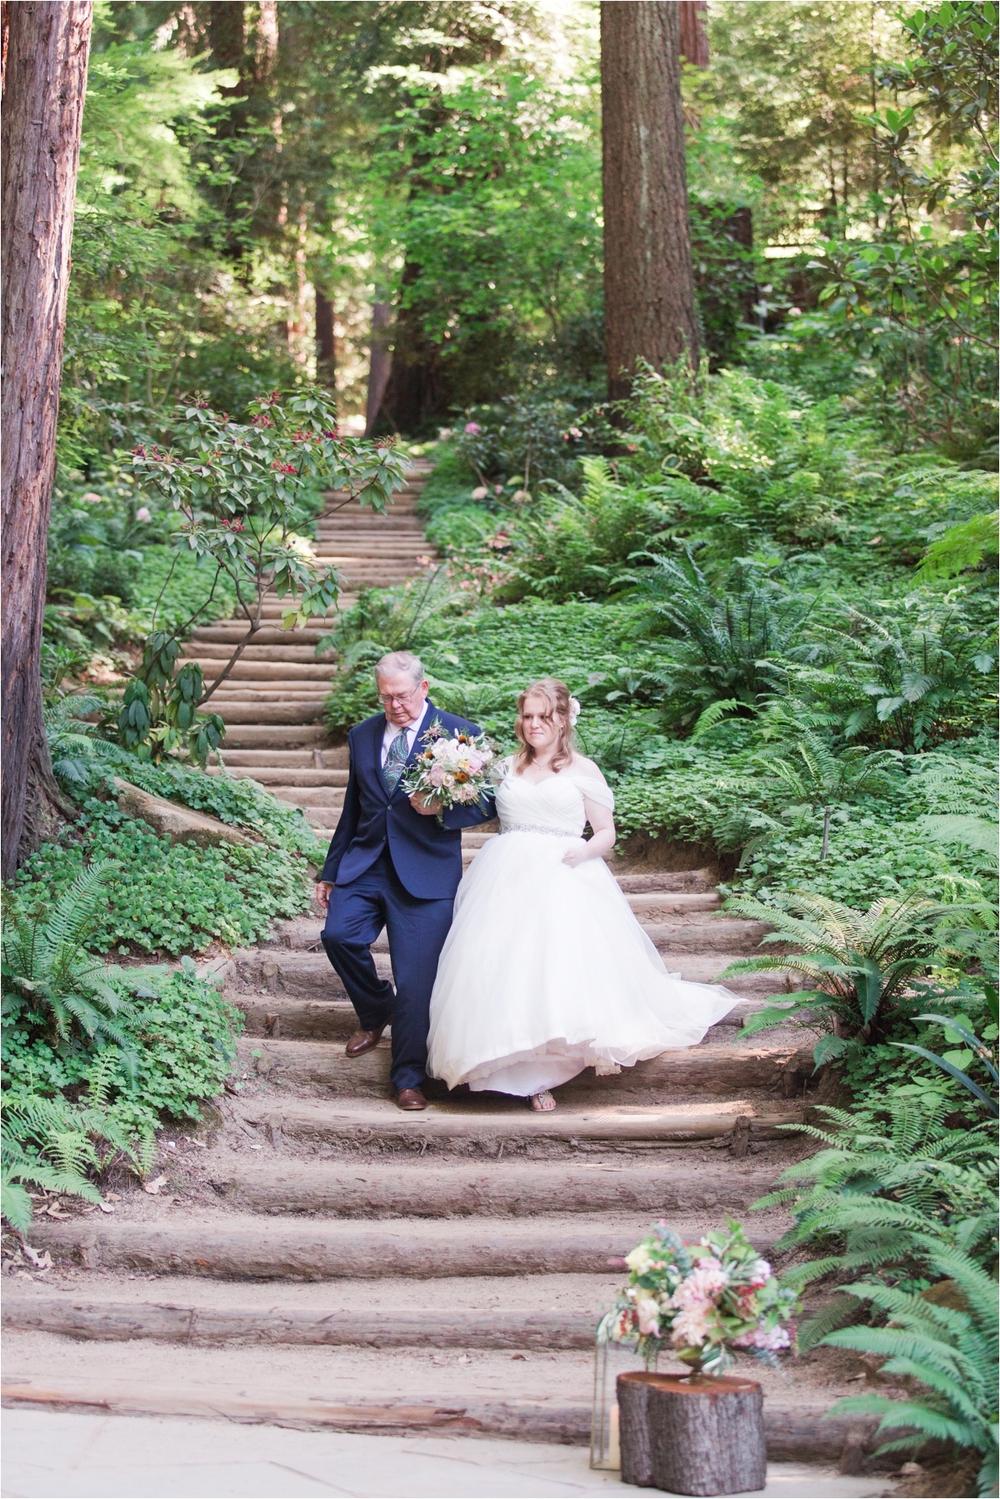 Nestldown wedding Photos by Briana Calderon Photography_0163.jpg